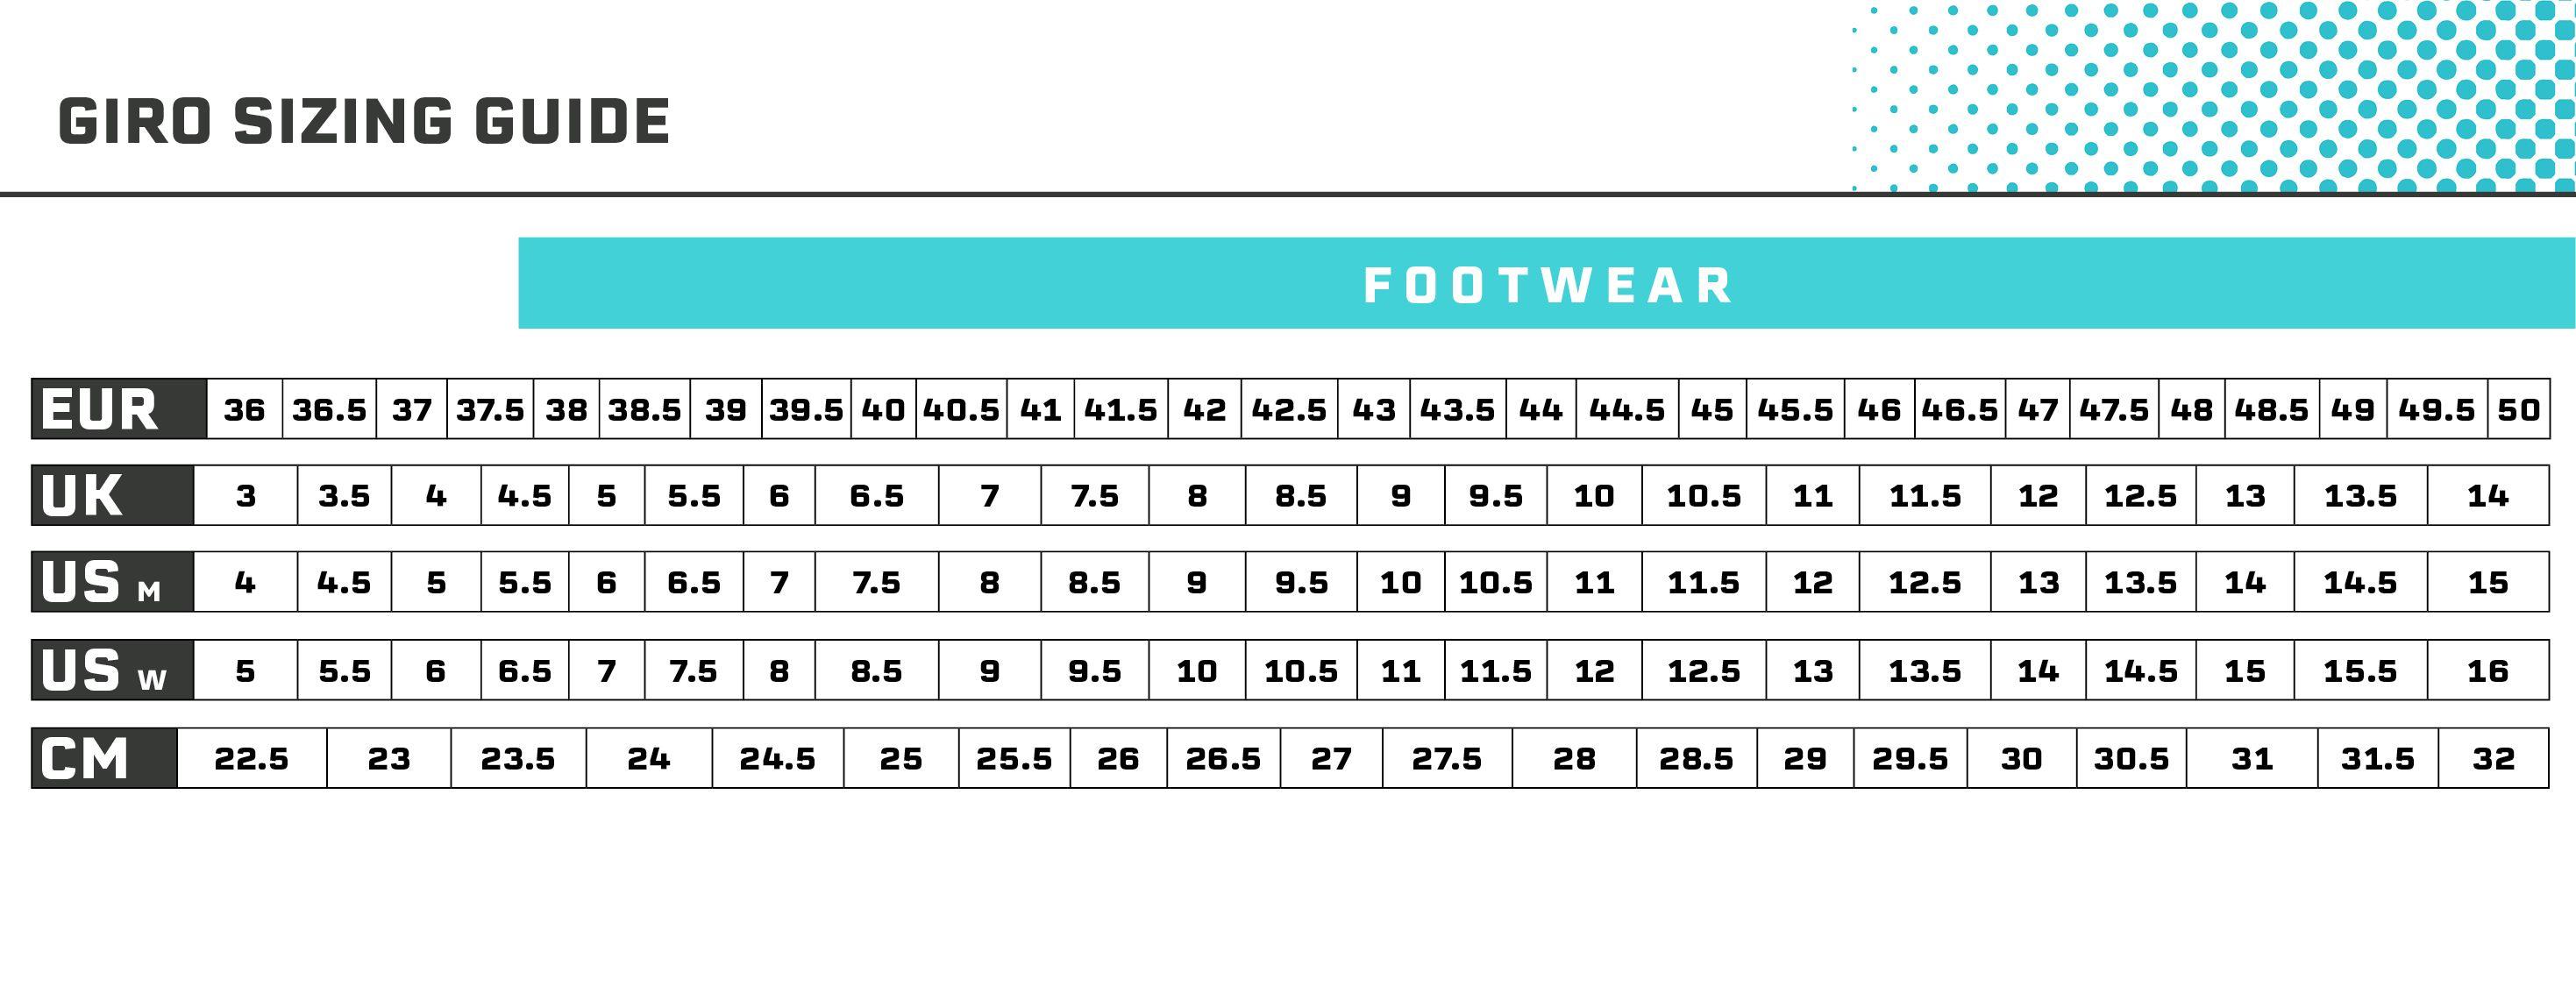 Giro Footwear Guide